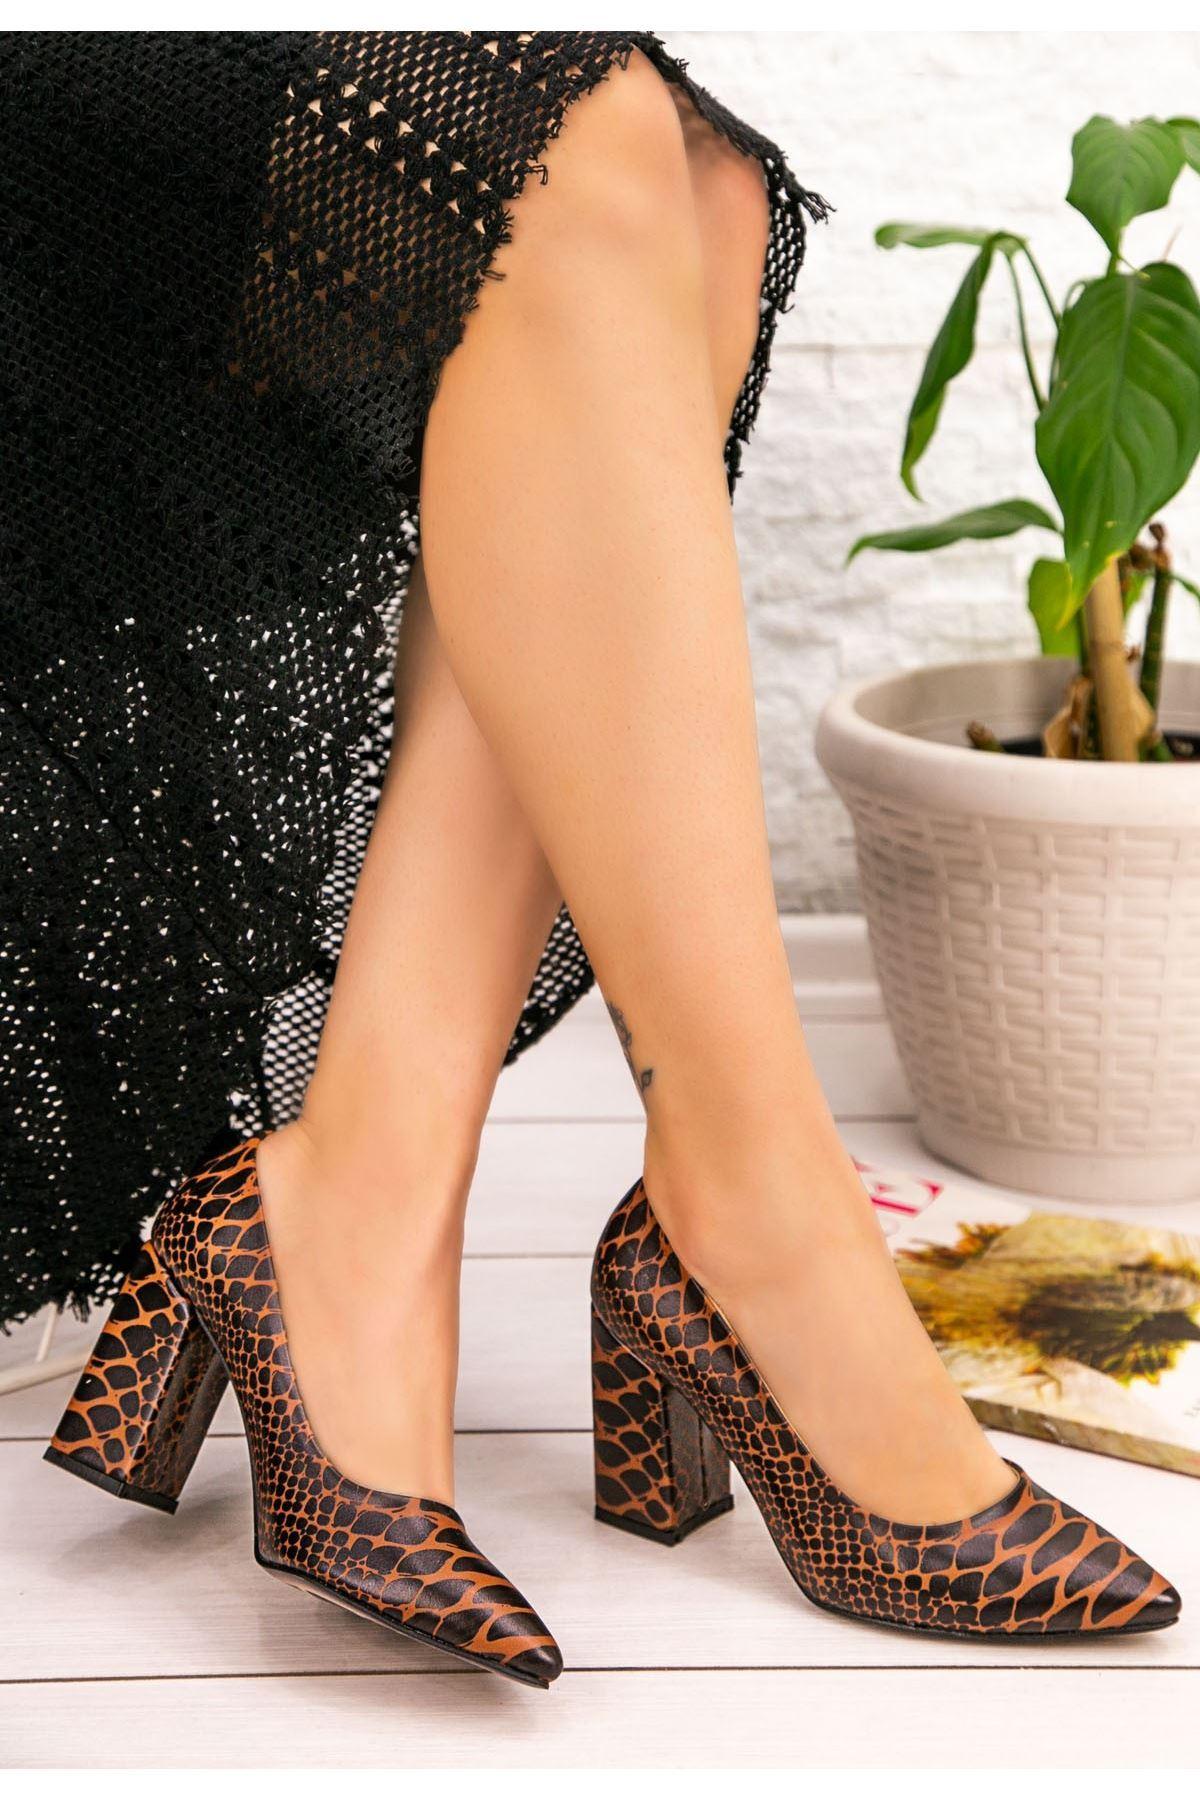 Sest Kahverengi Cilt Yılan Detaylı Topuklu Ayakkabı